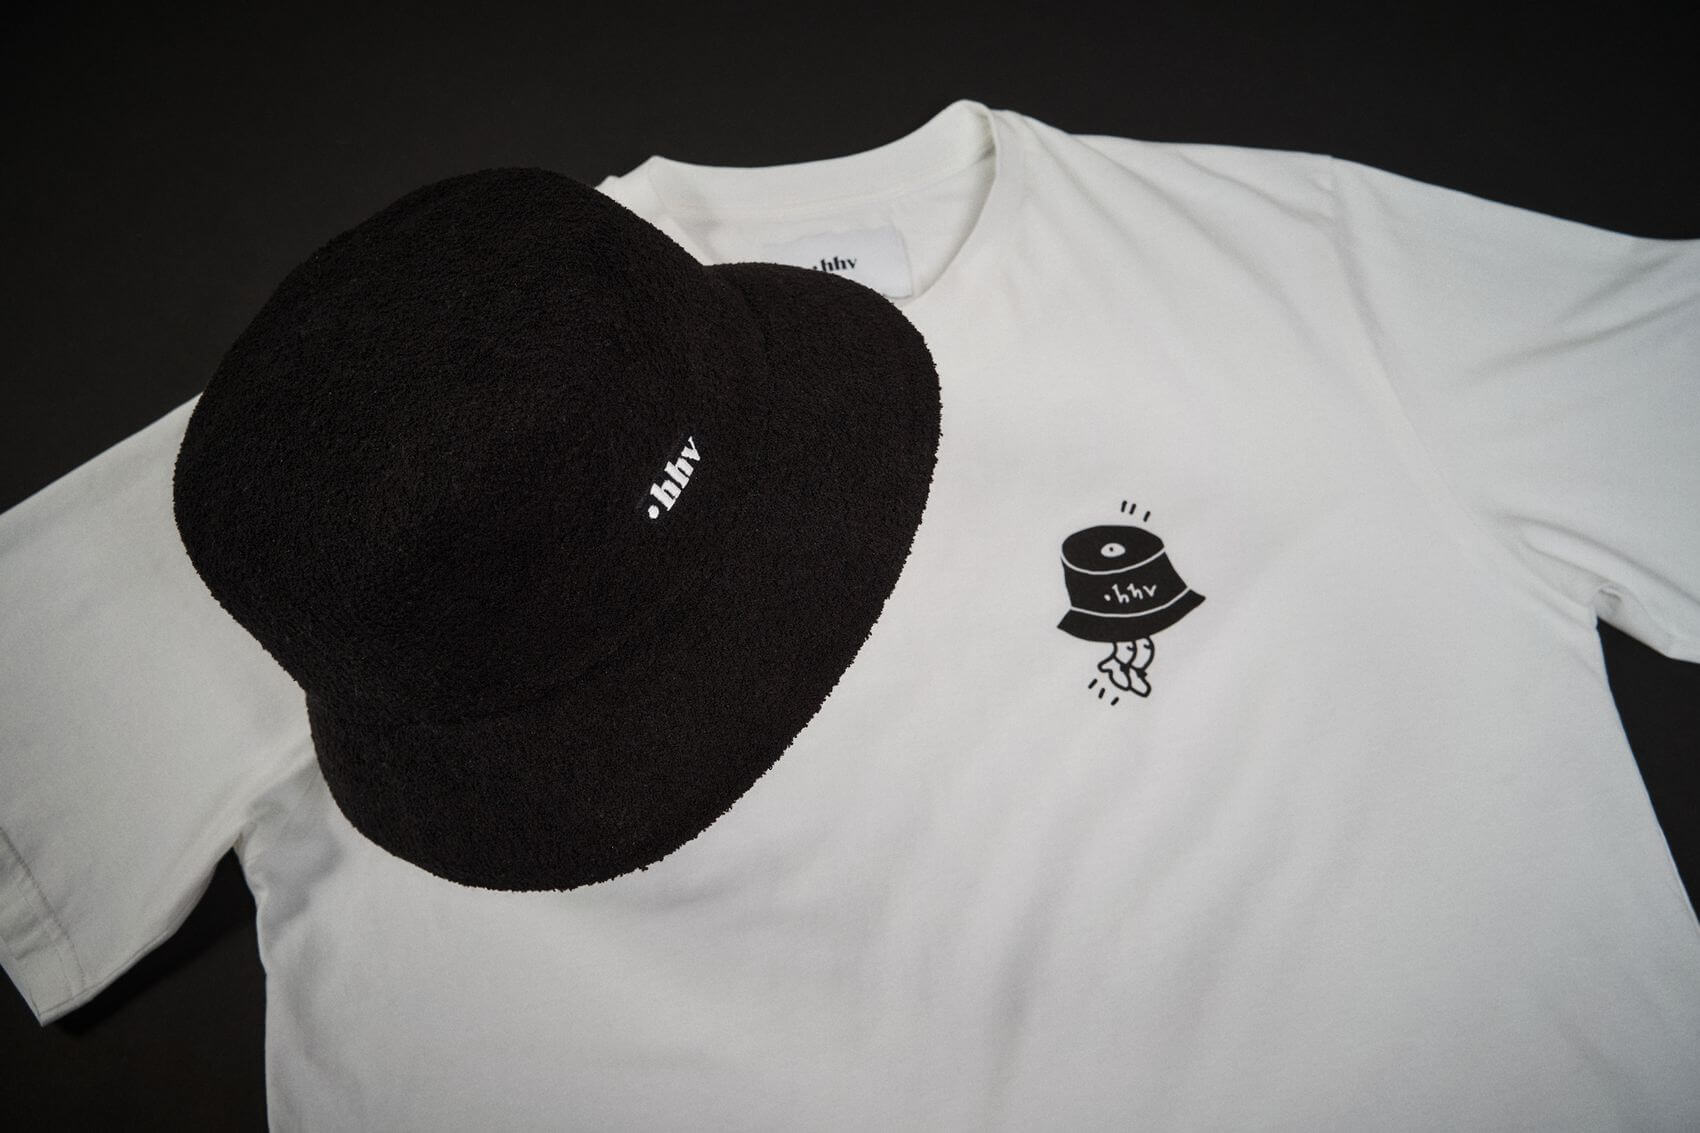 HHV x Kangol - Bermuda Bucket Hat - black/white